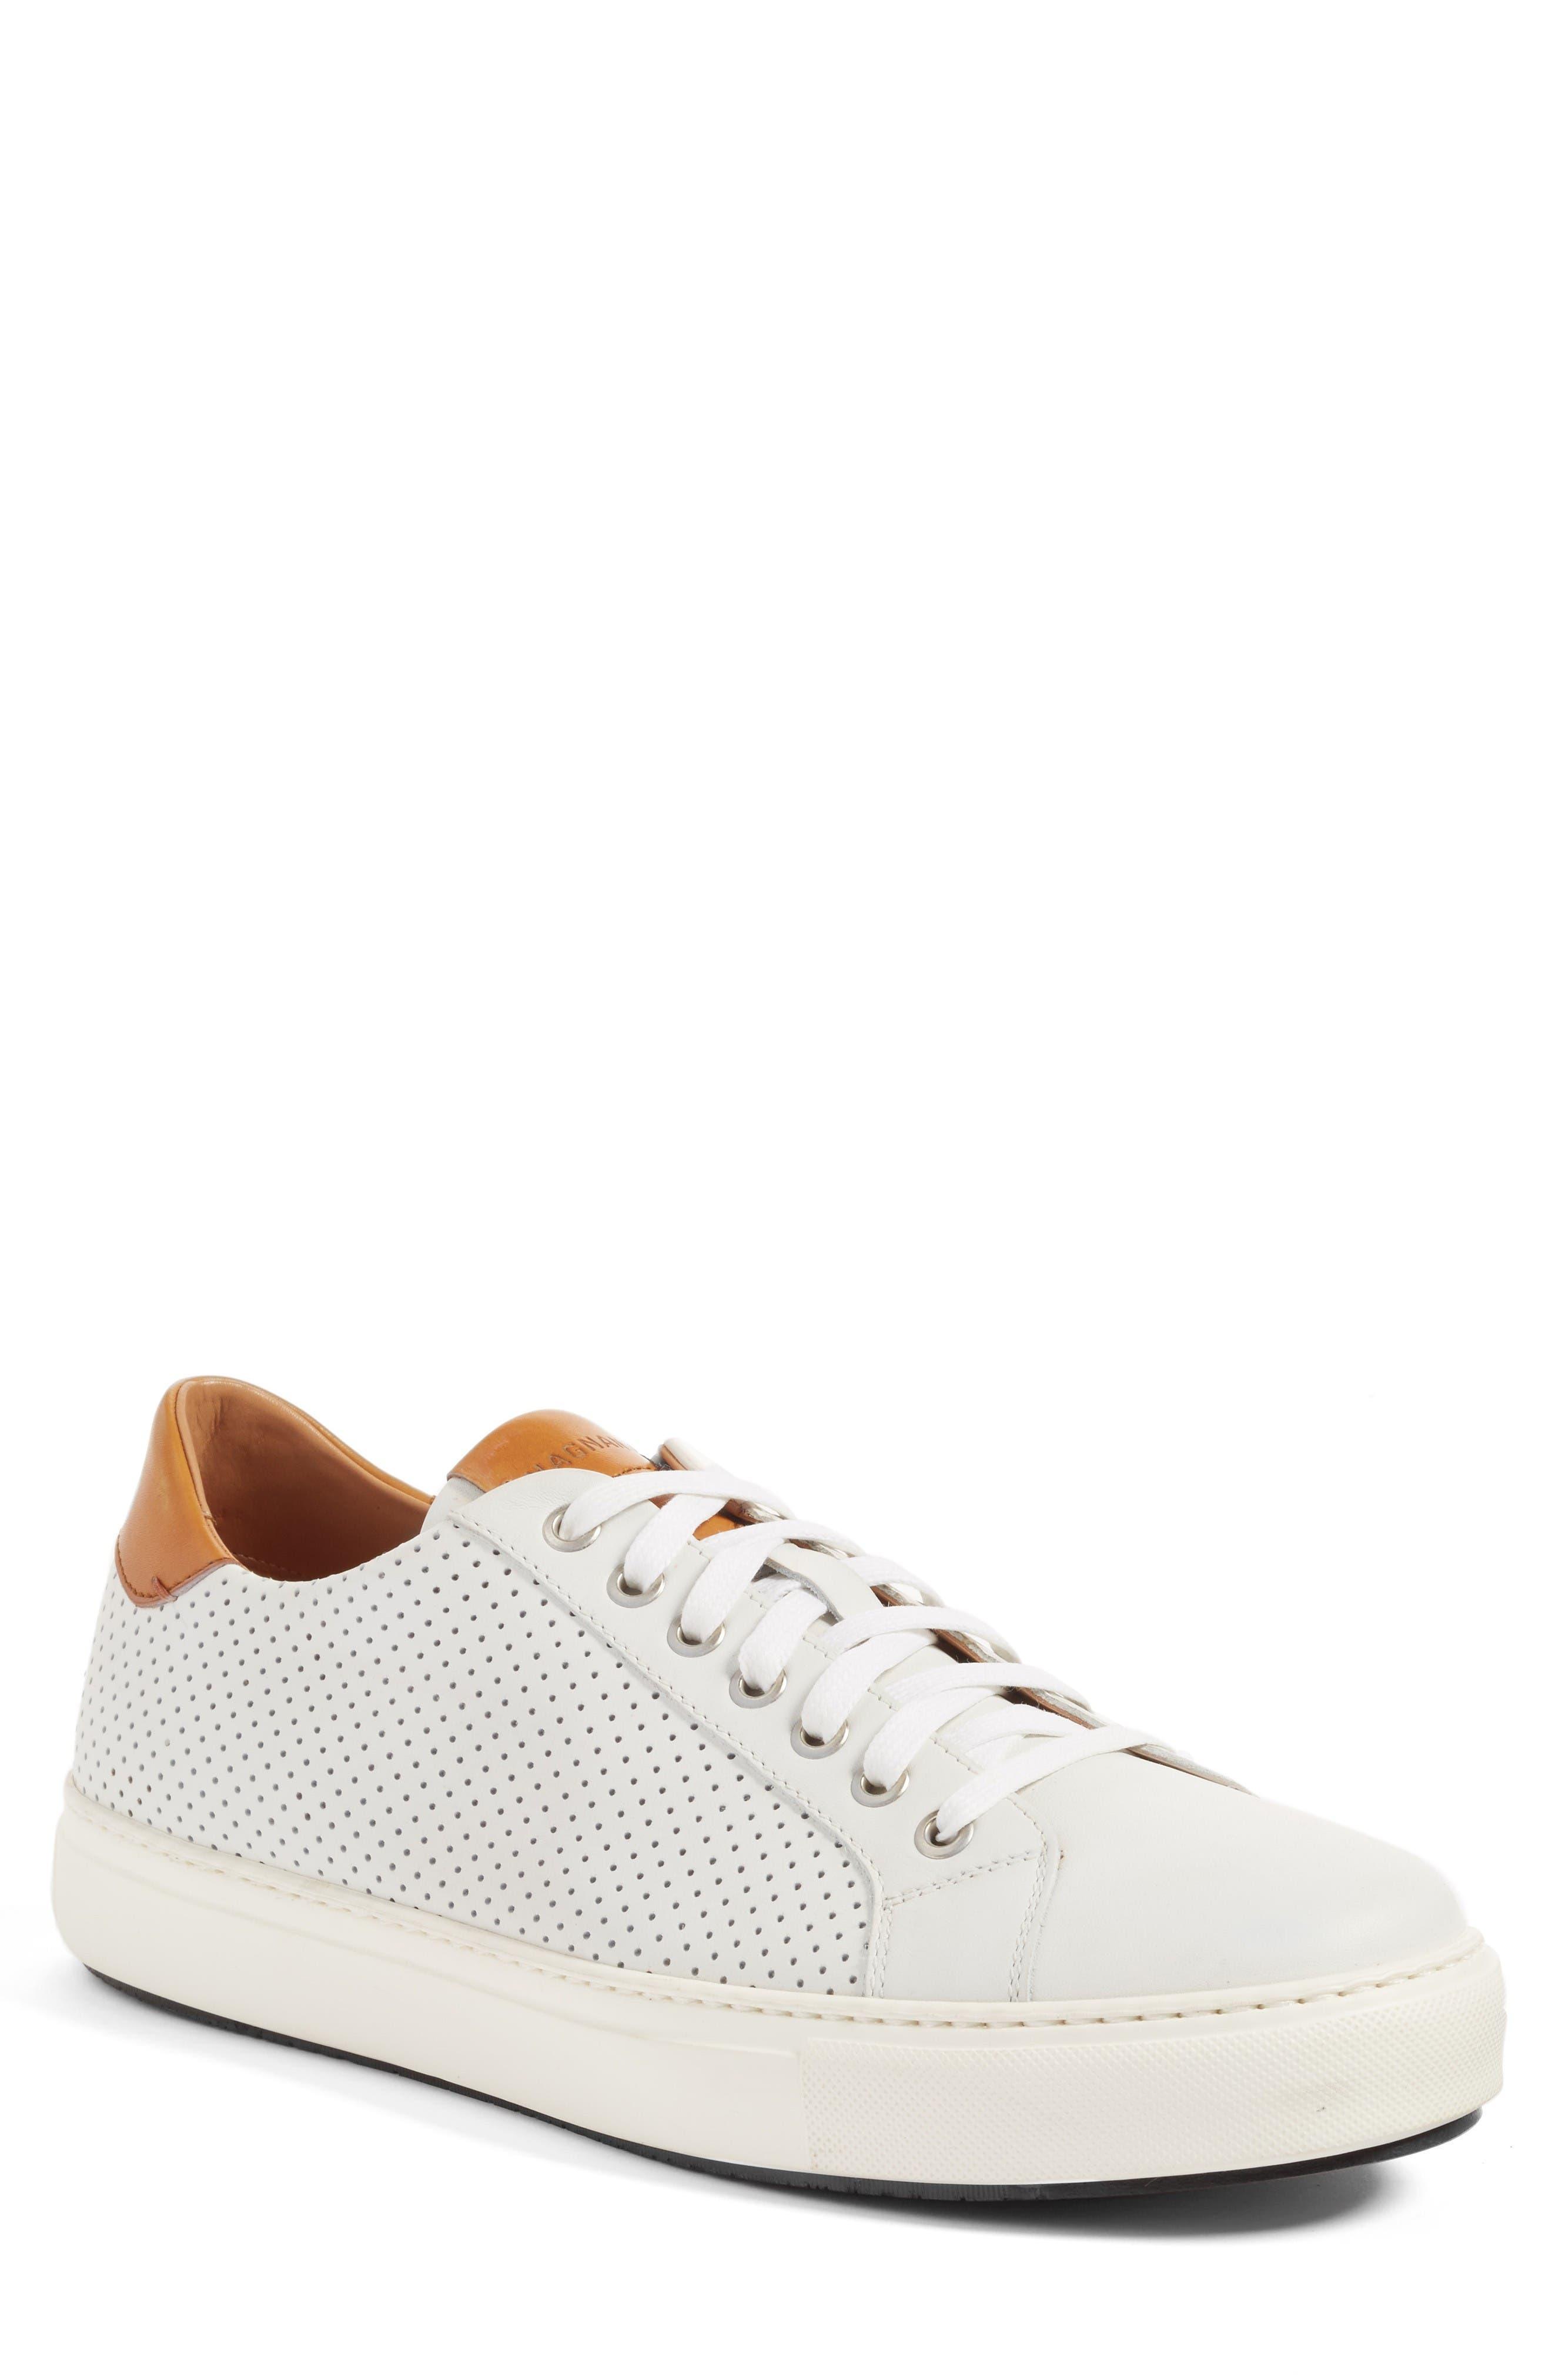 Magnanni Blanco Lo Sneaker (Men)